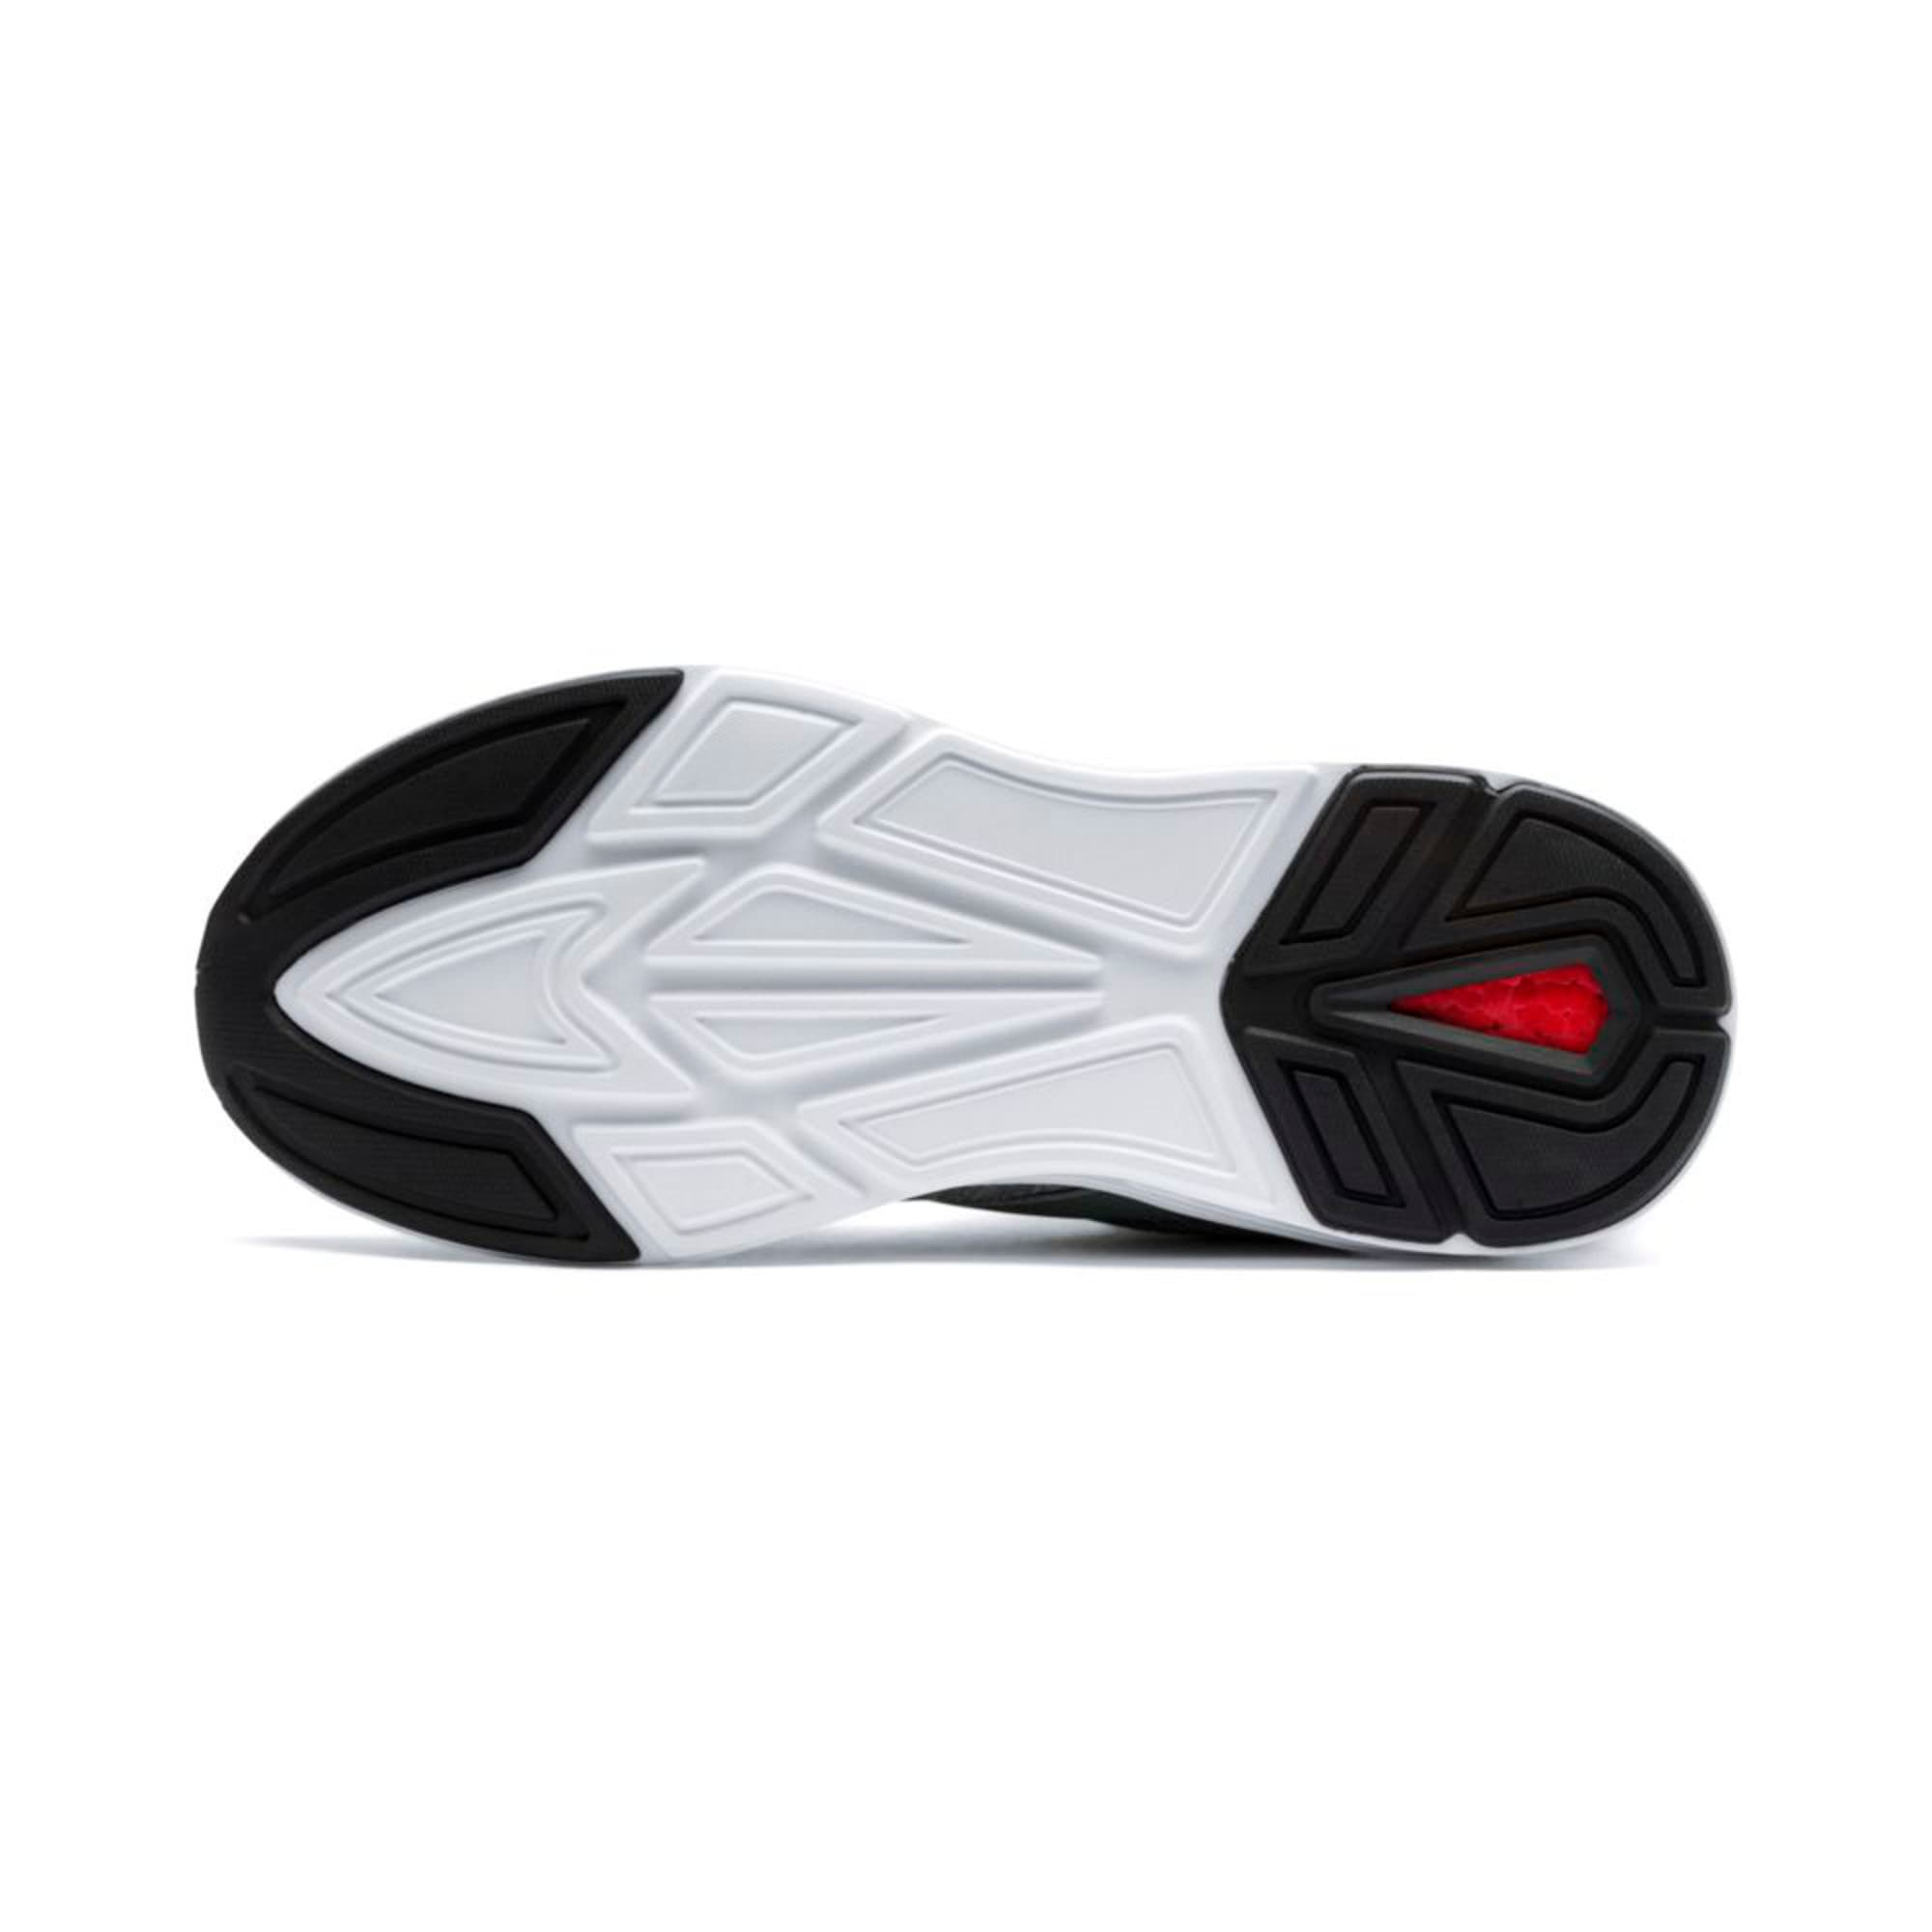 Thumbnail 2 of NRGY Comet Running Shoes, Laurel Wreath-Puma White, medium-IND